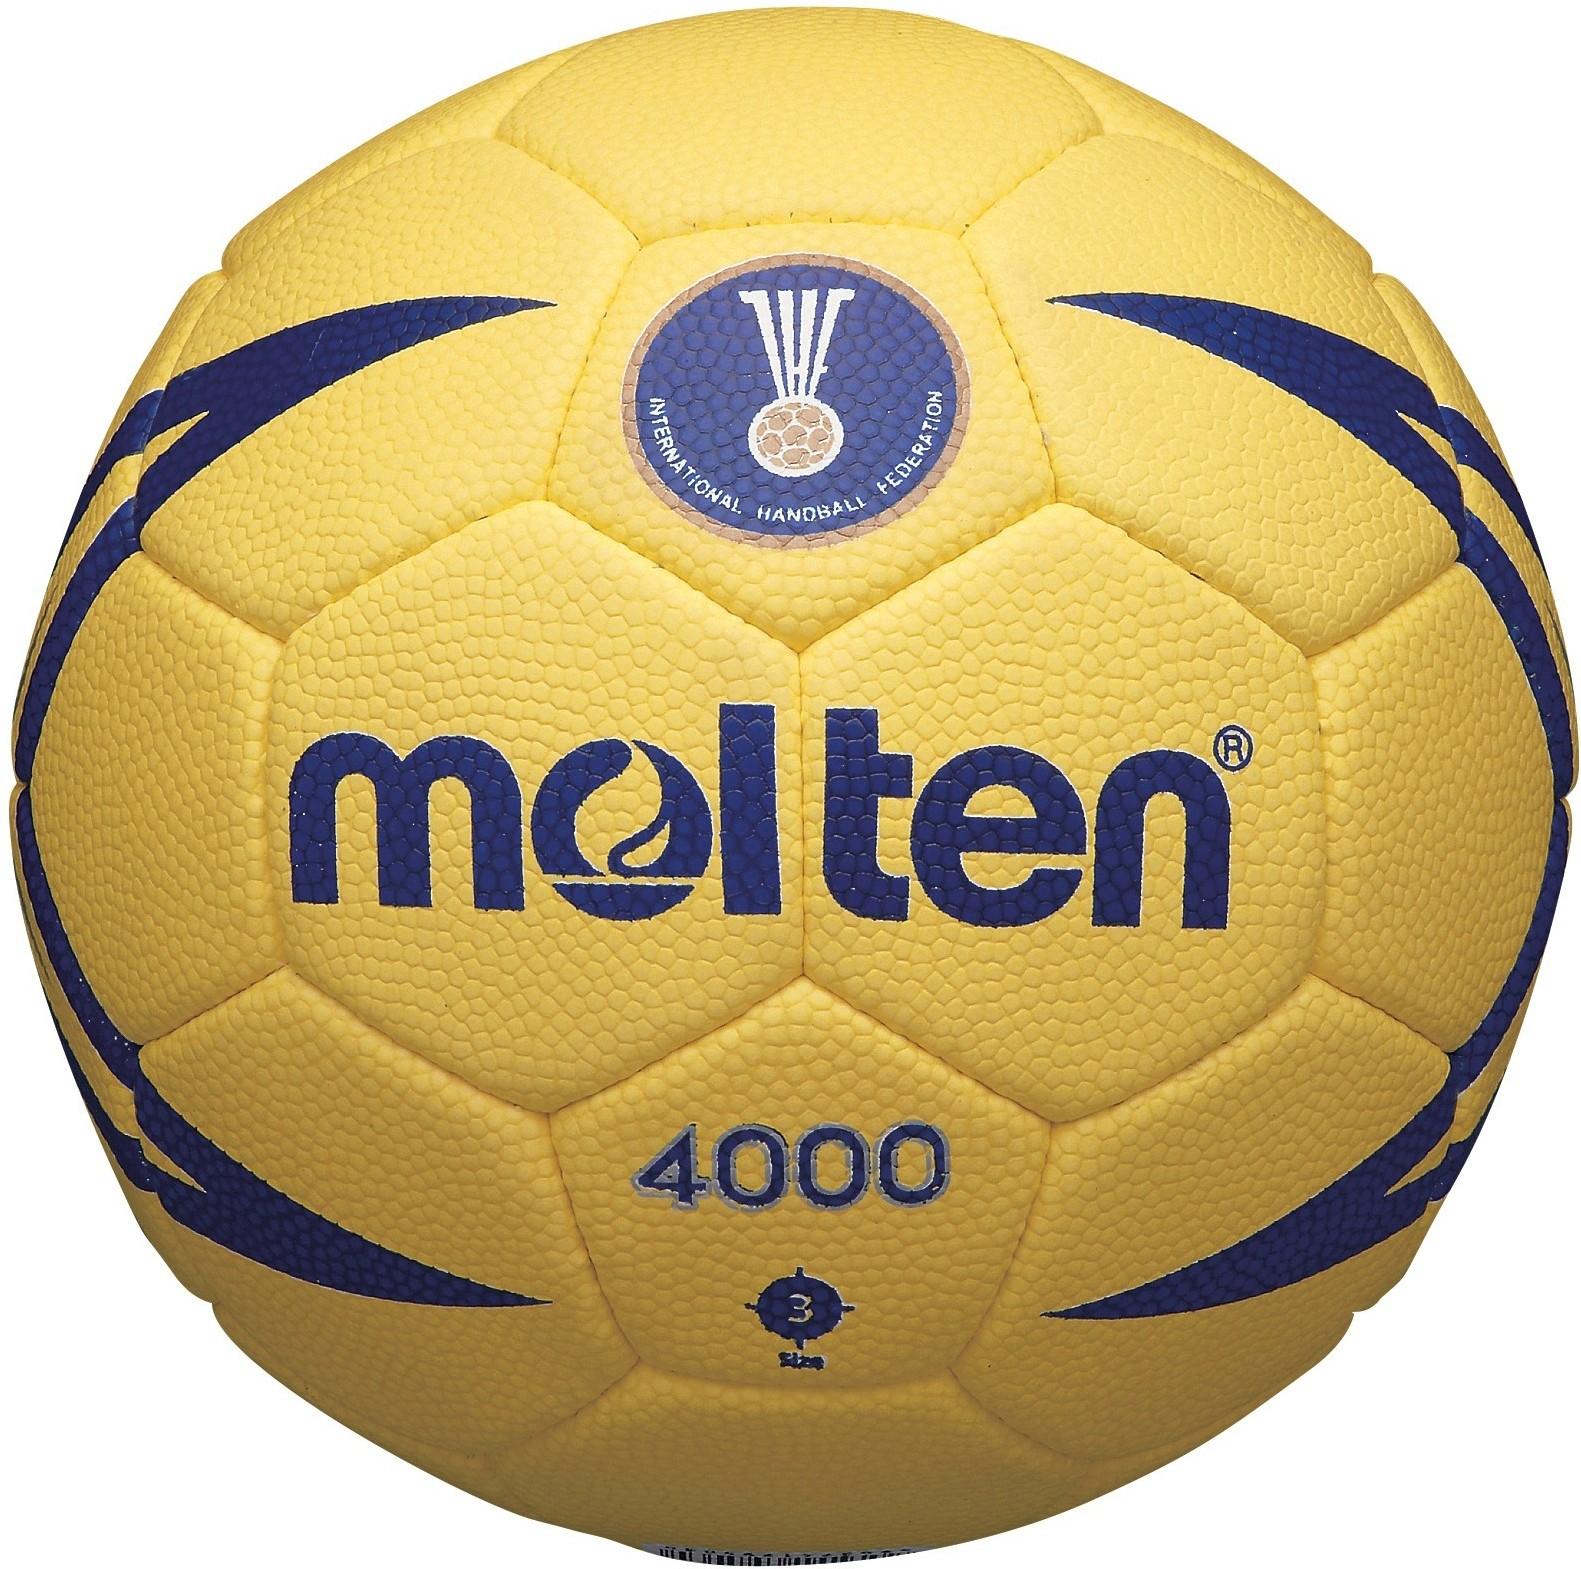 IHF Approved PU Leather Handball